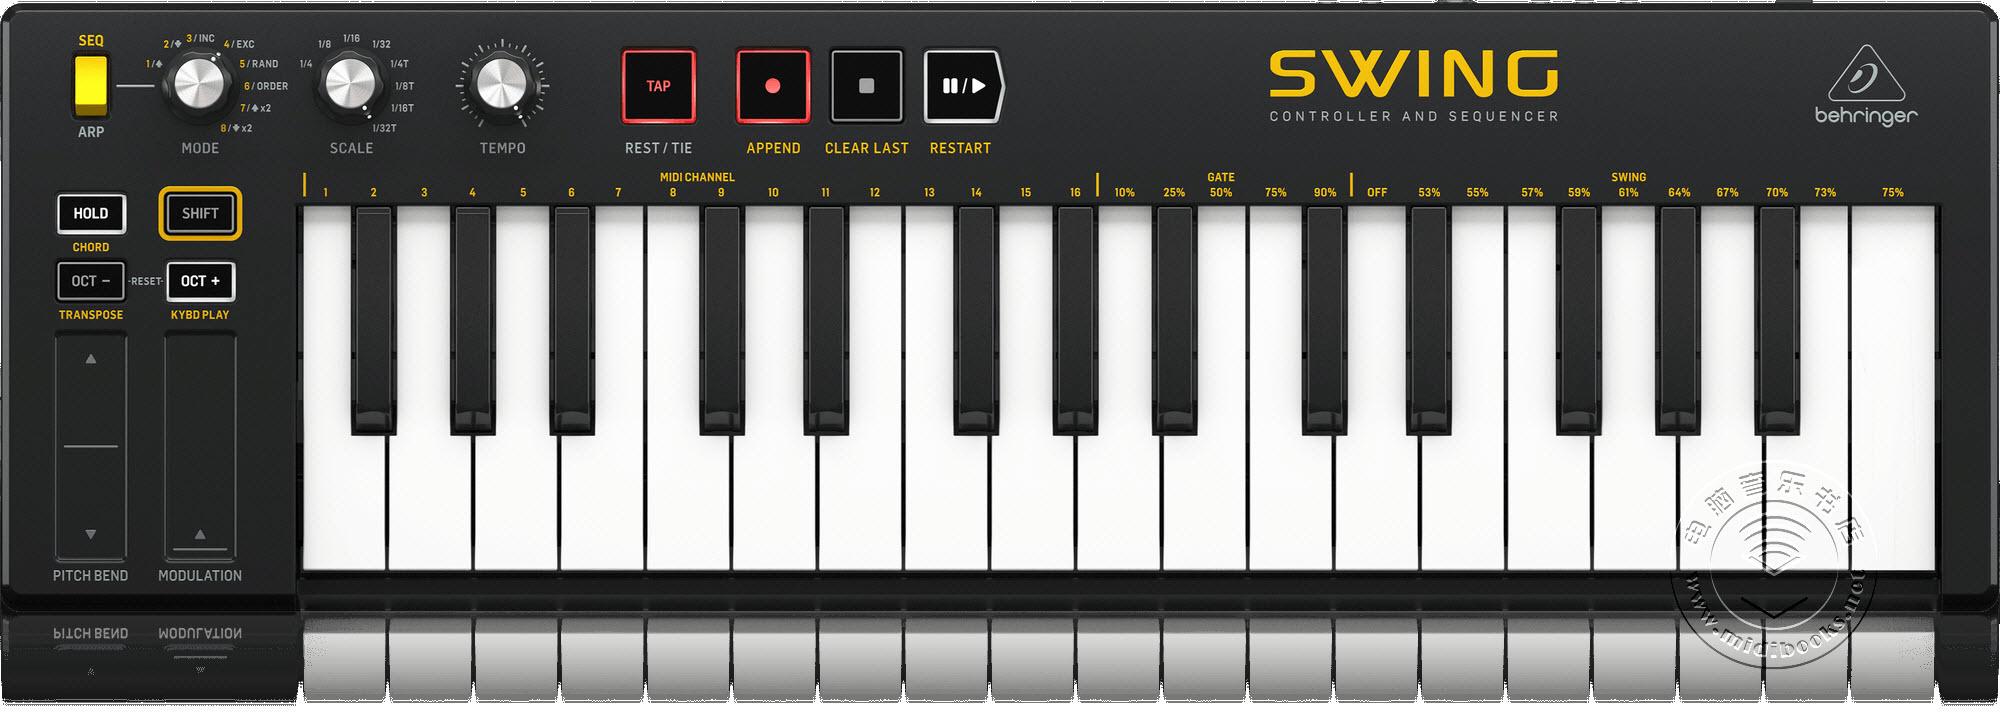 百灵达(Behringer)发布SWING MIDI键盘控制器(视频)